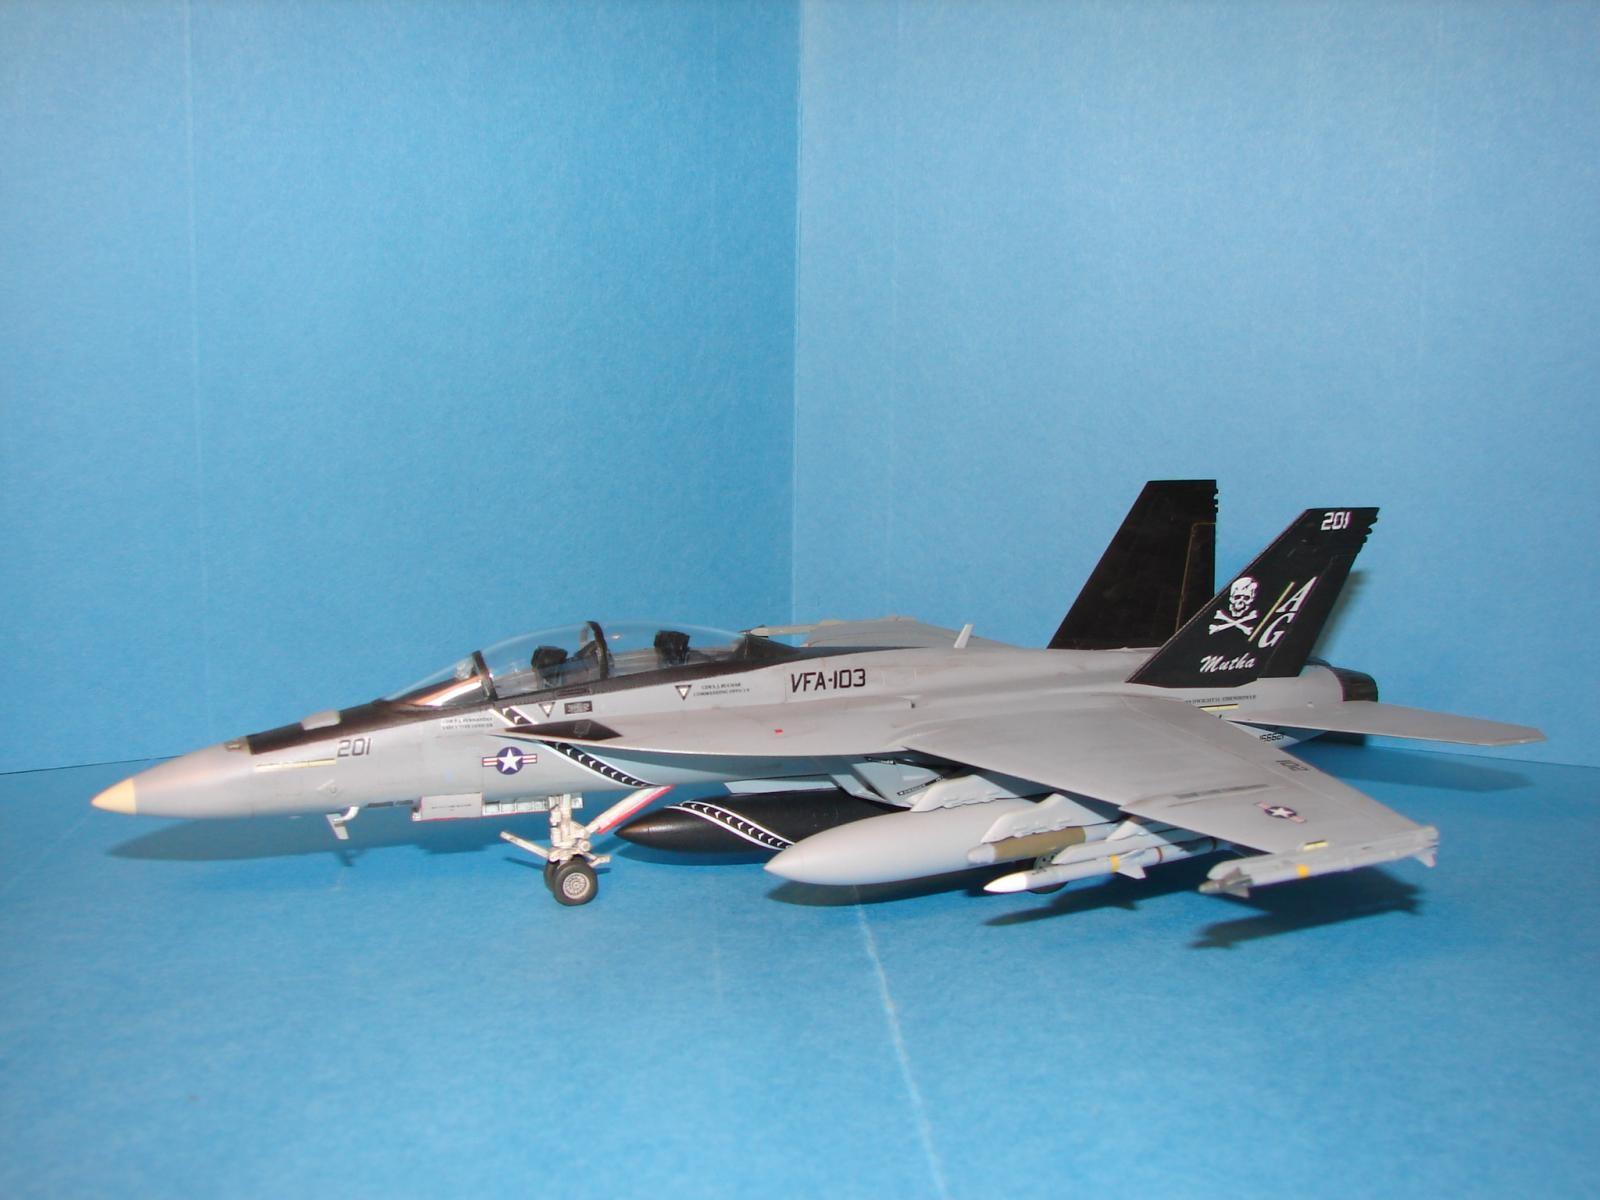 1/72 Academy press-fit F/A-18F | iModeler